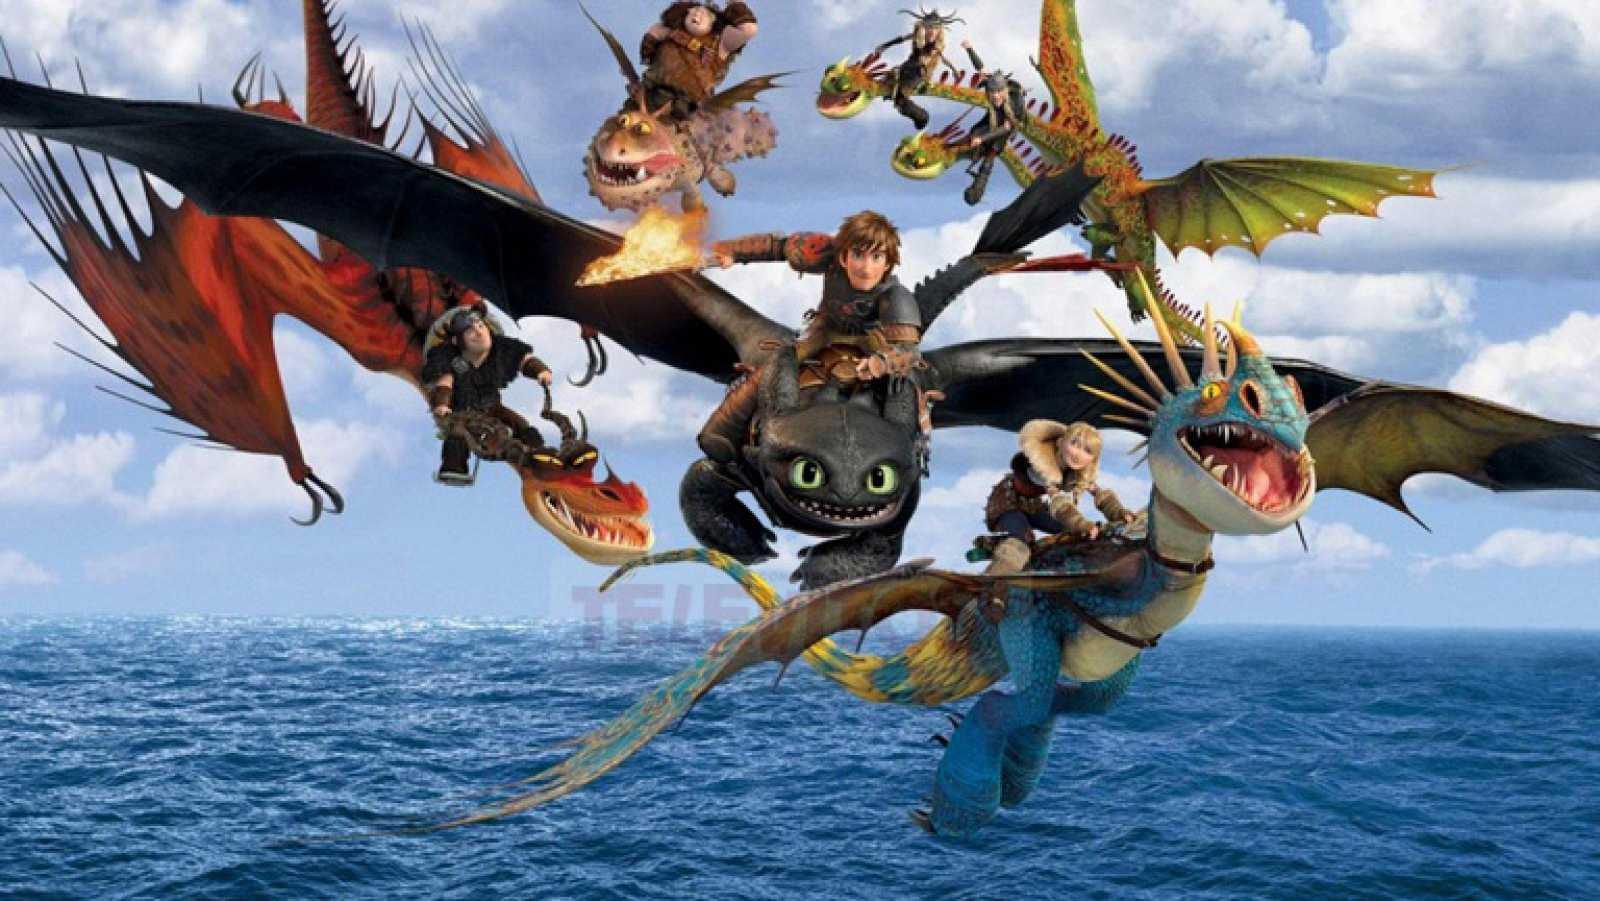 Imagenes De Como Entrenar A Tu Dragon Marynott Imagenes